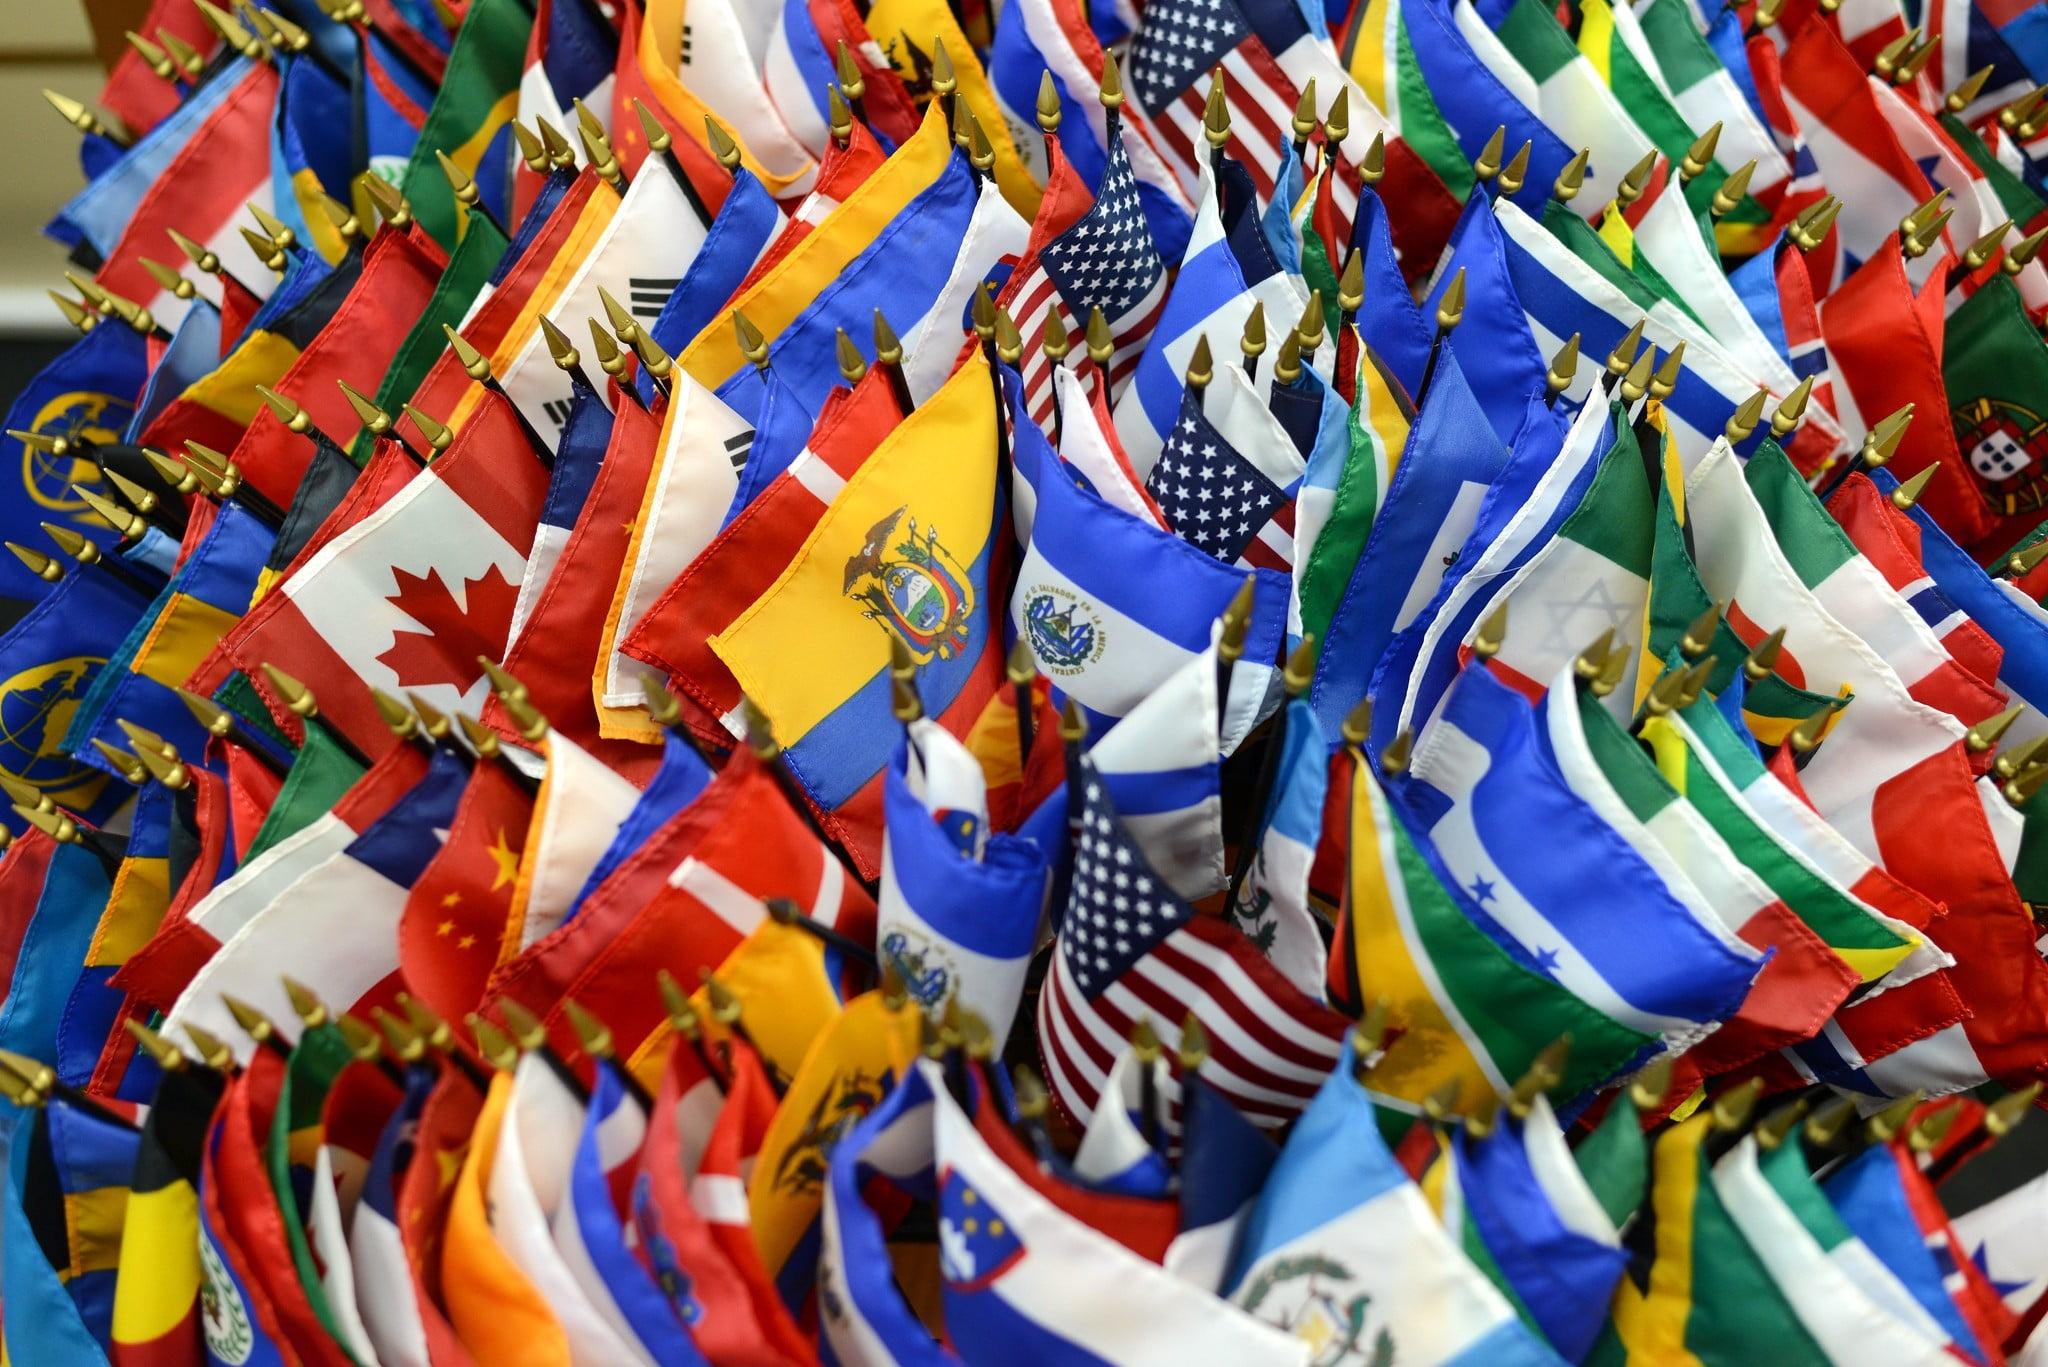 economía latinoamericana, América Latina, banderas